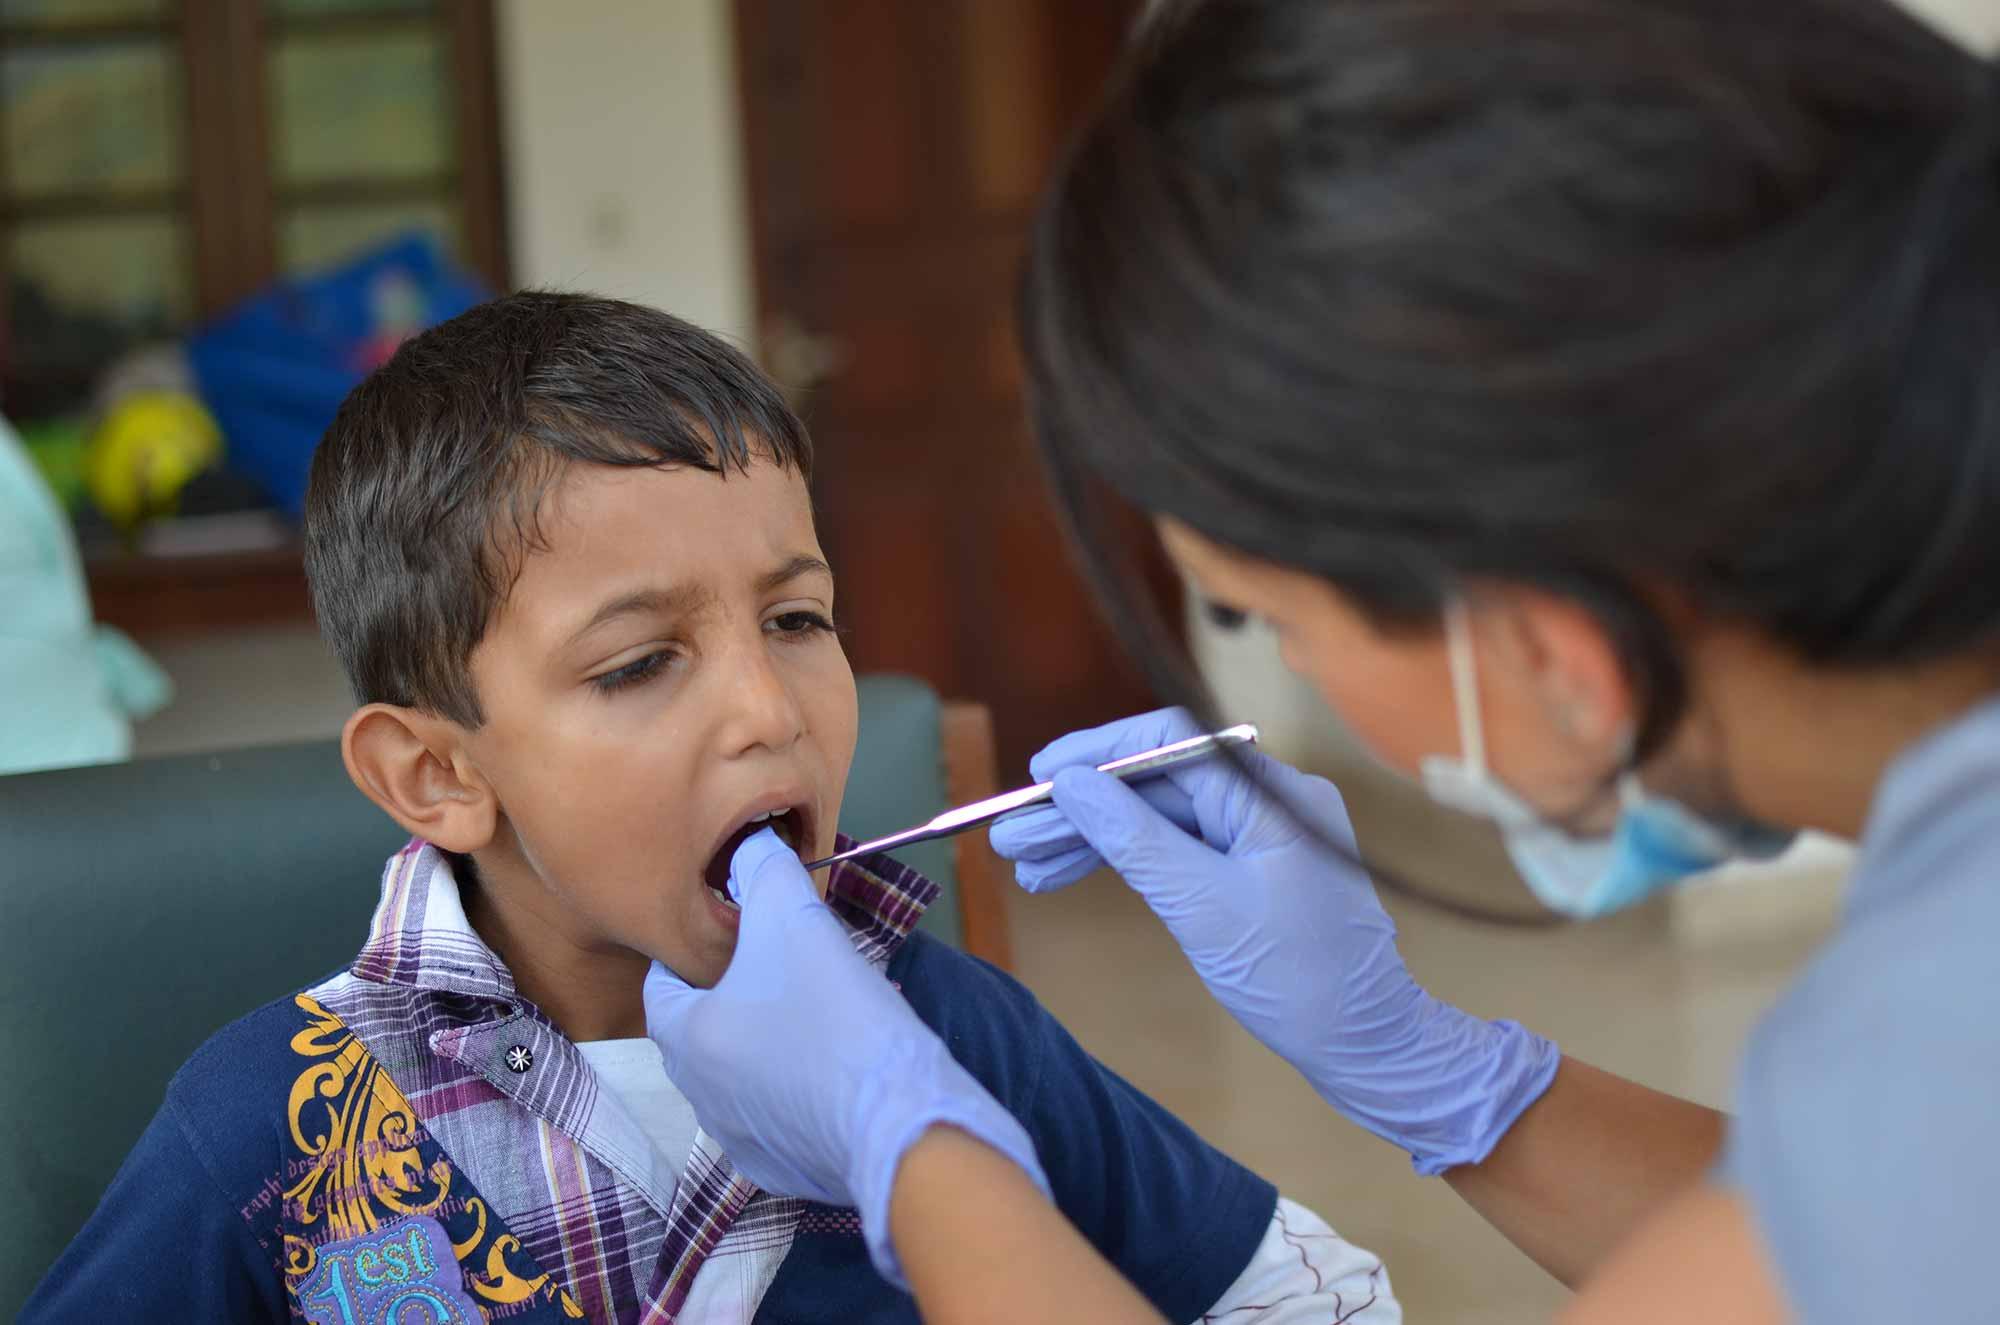 Midlands Doctors Charity helps people in need in Pakistan